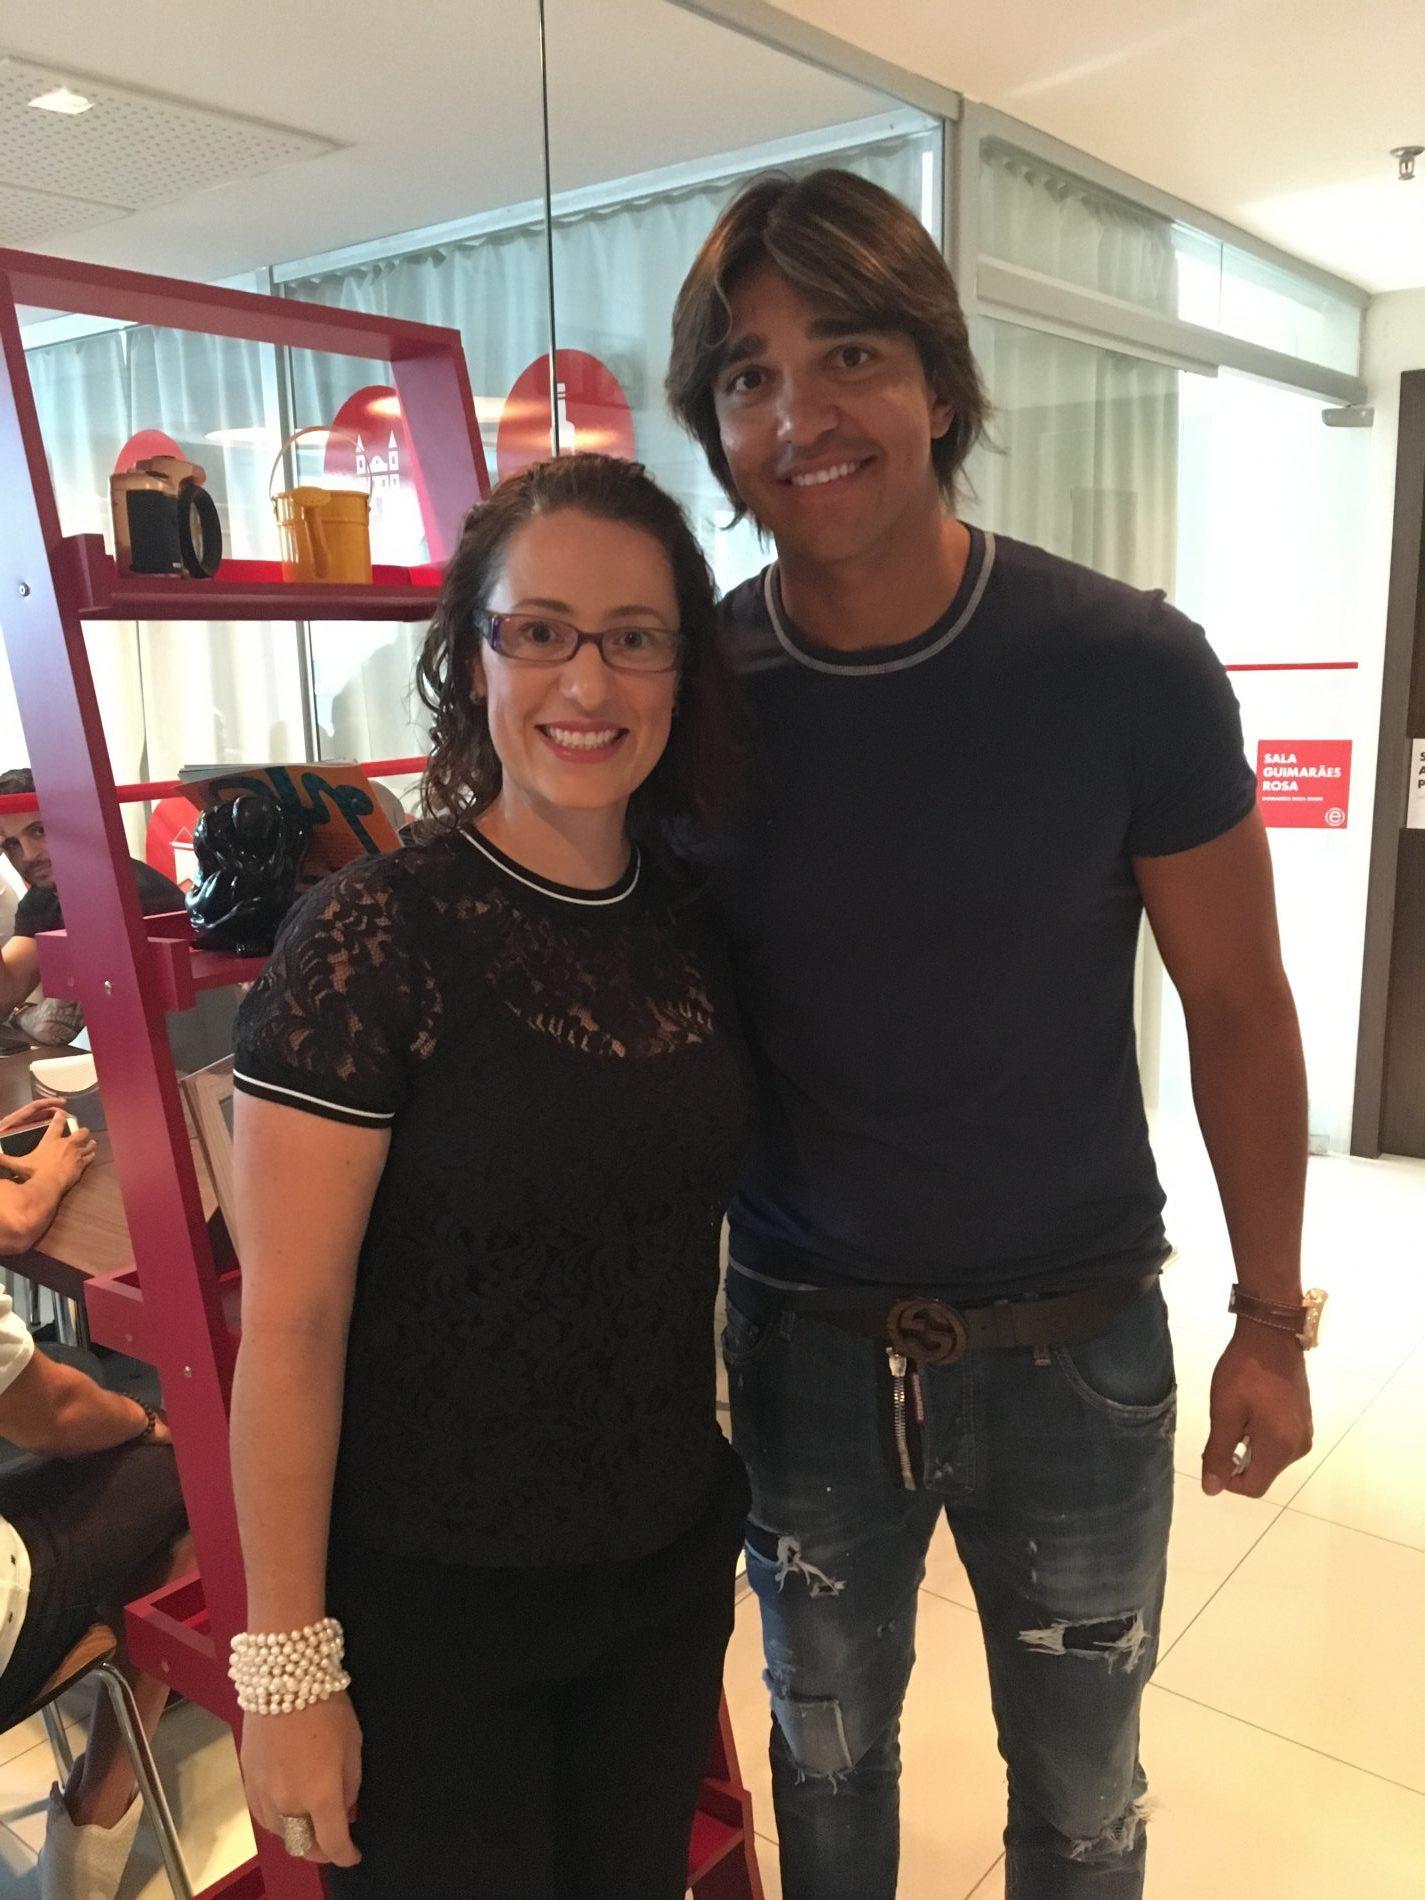 Camila Gischewski, gerente geral do Ramada Encore Minascasa, com o jogador Marcelo Moreno